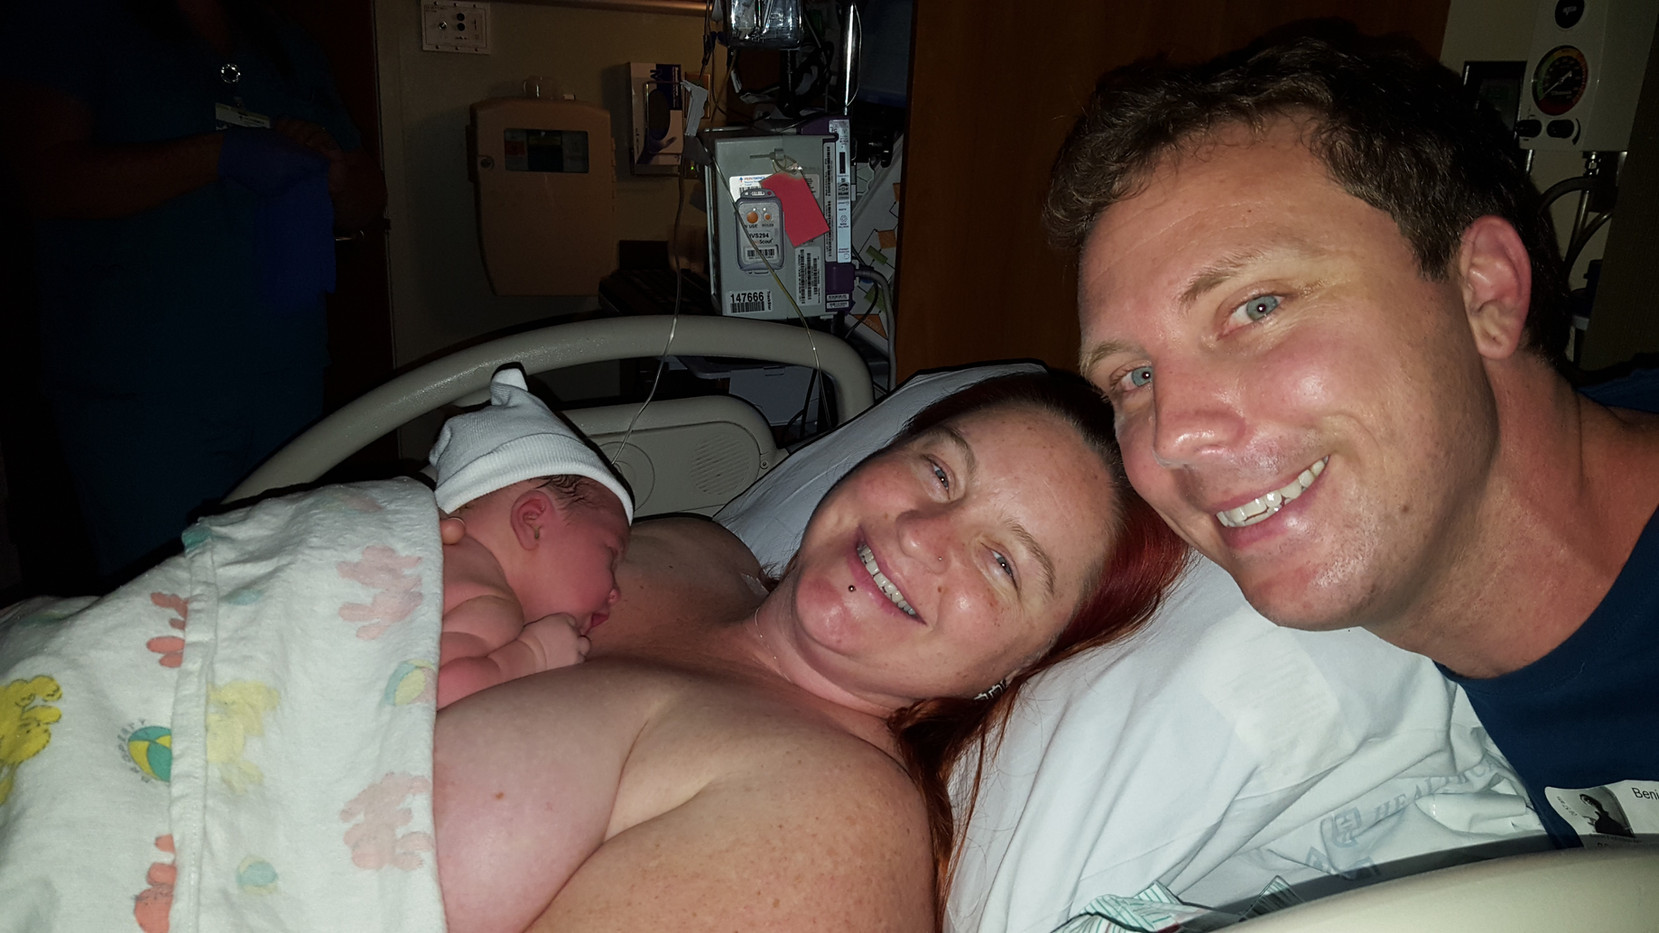 Family at last